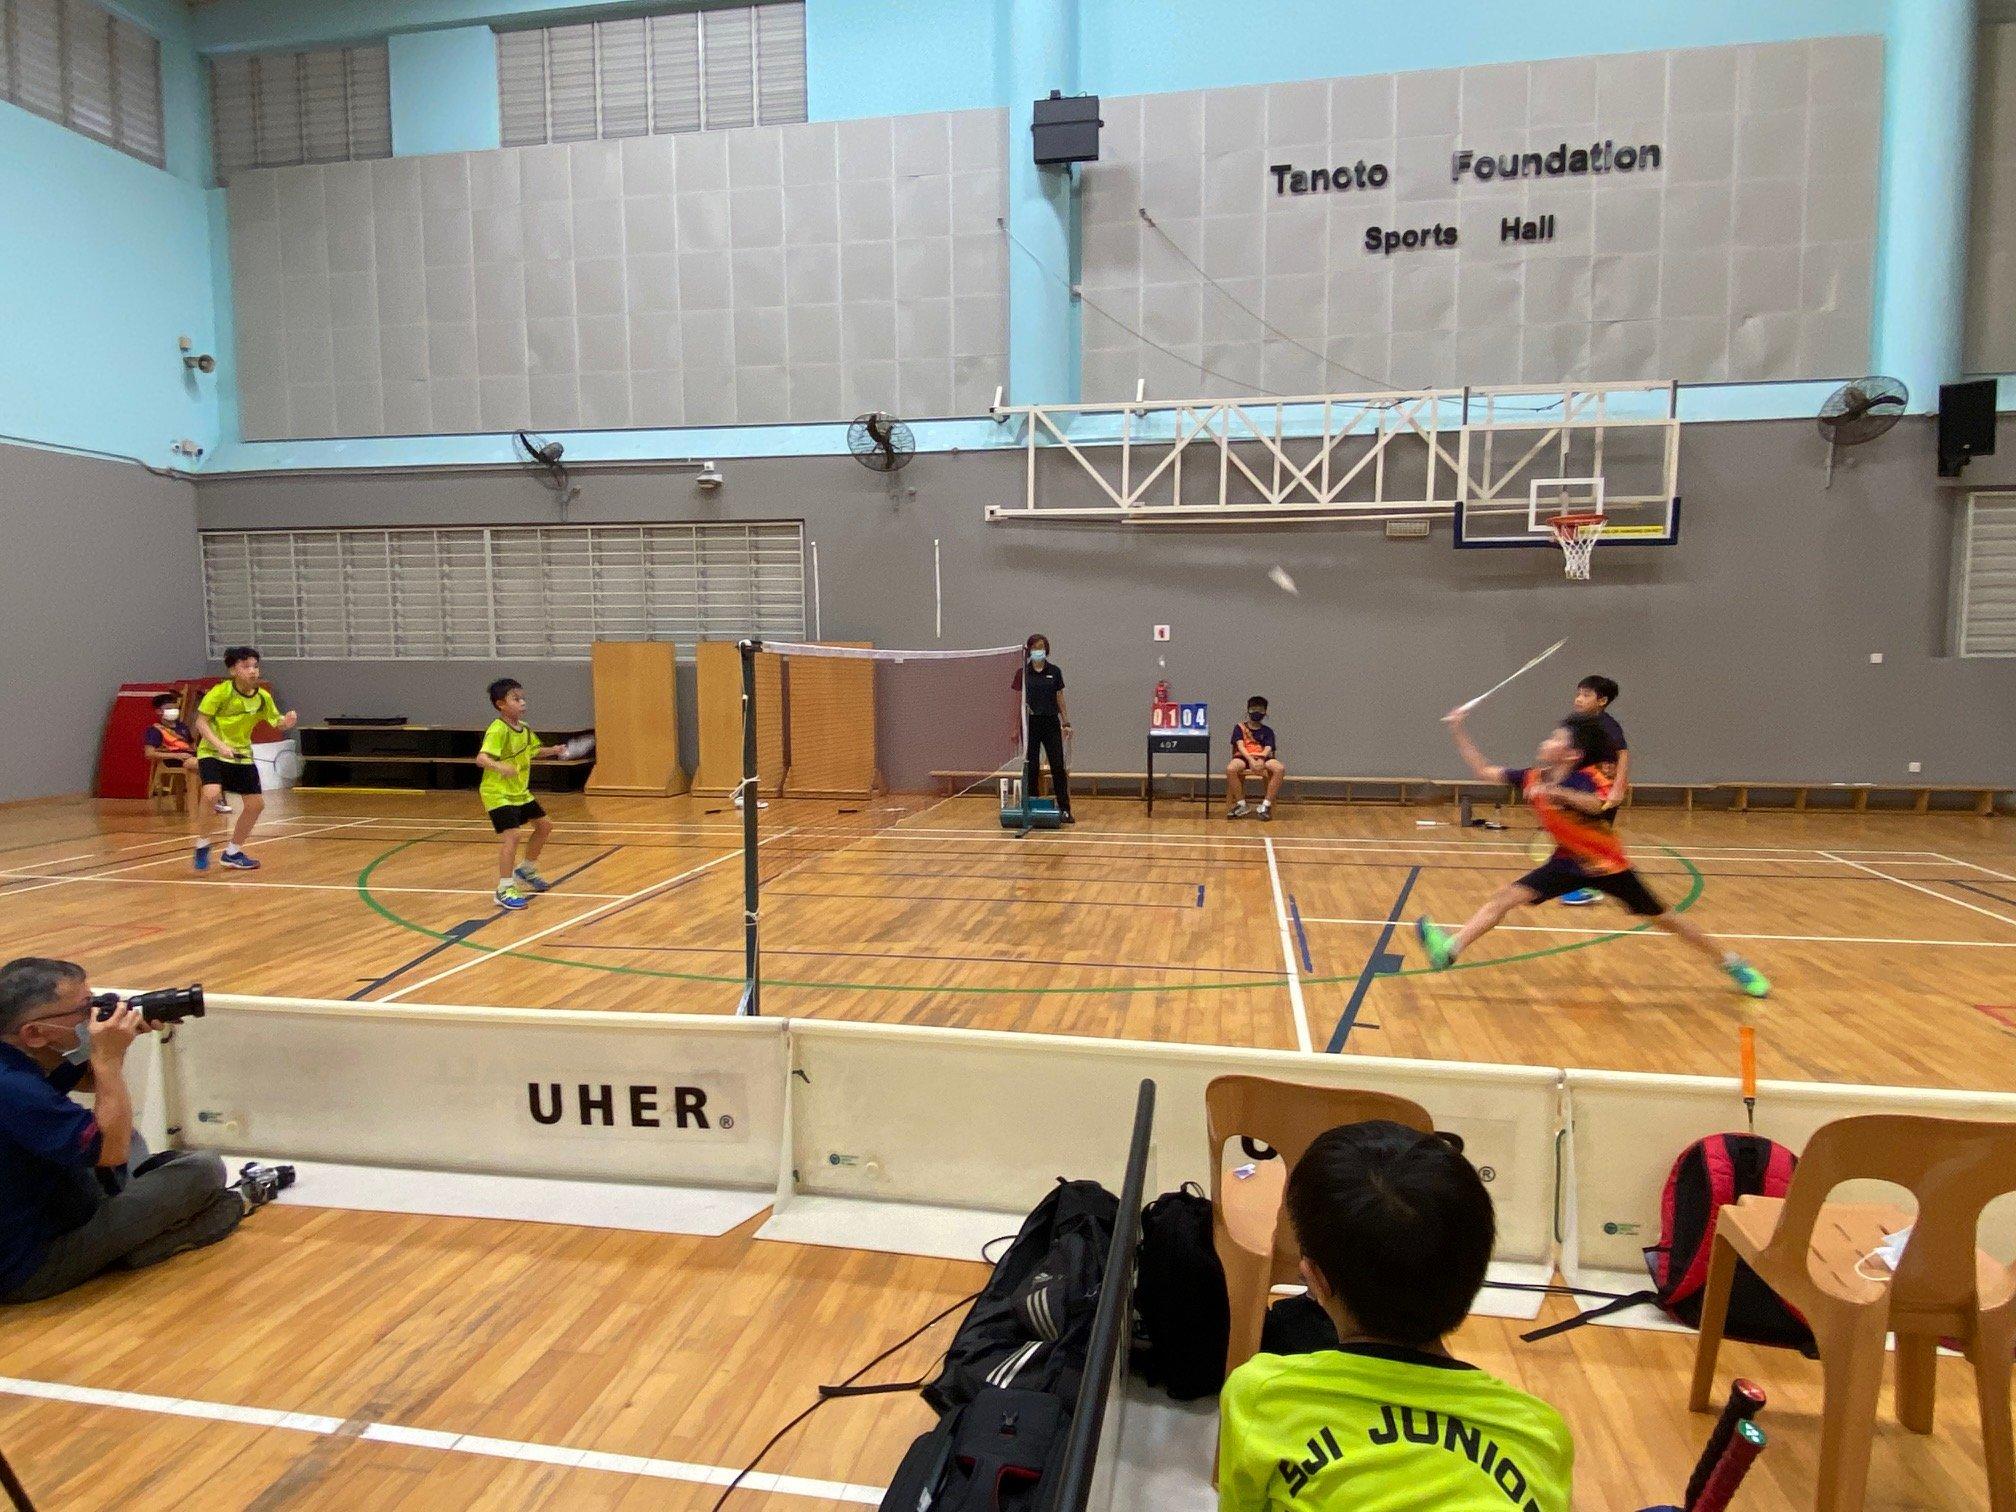 NSG Snr Div South Zone boys' badminton_ SJI Junior (green) vs ACS Primary (orange) 3